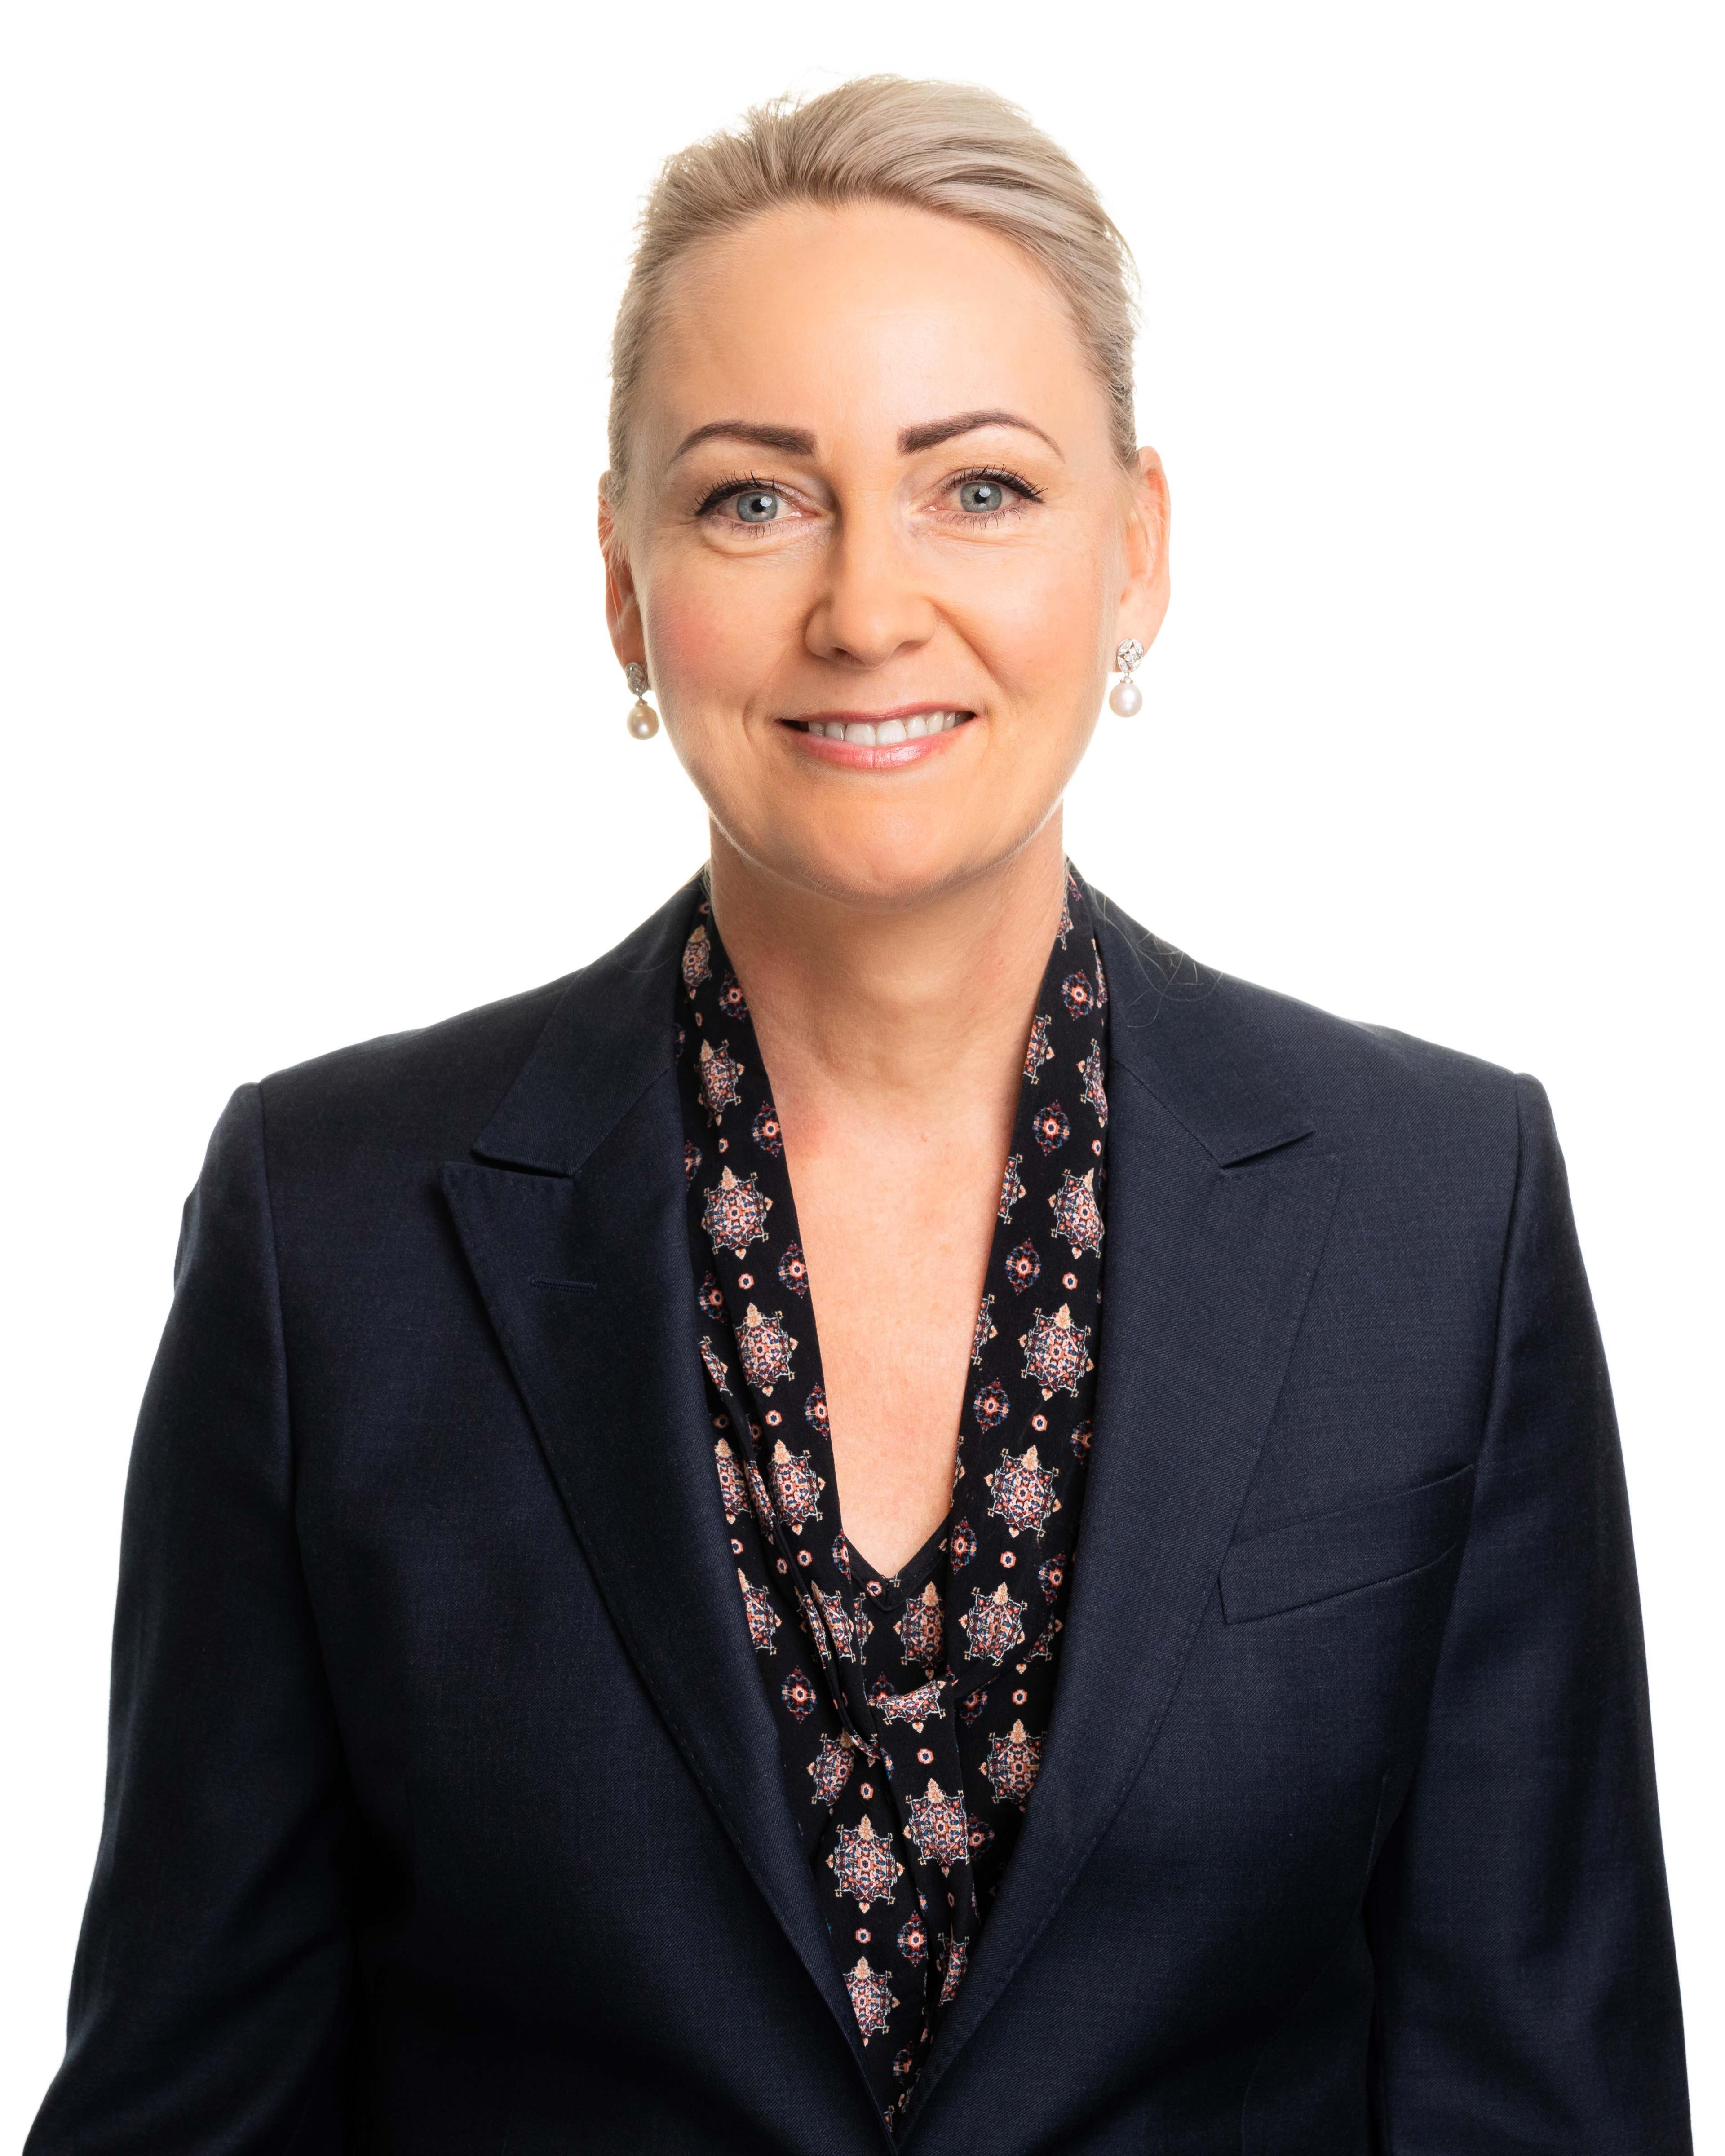 Sonia Mortimer